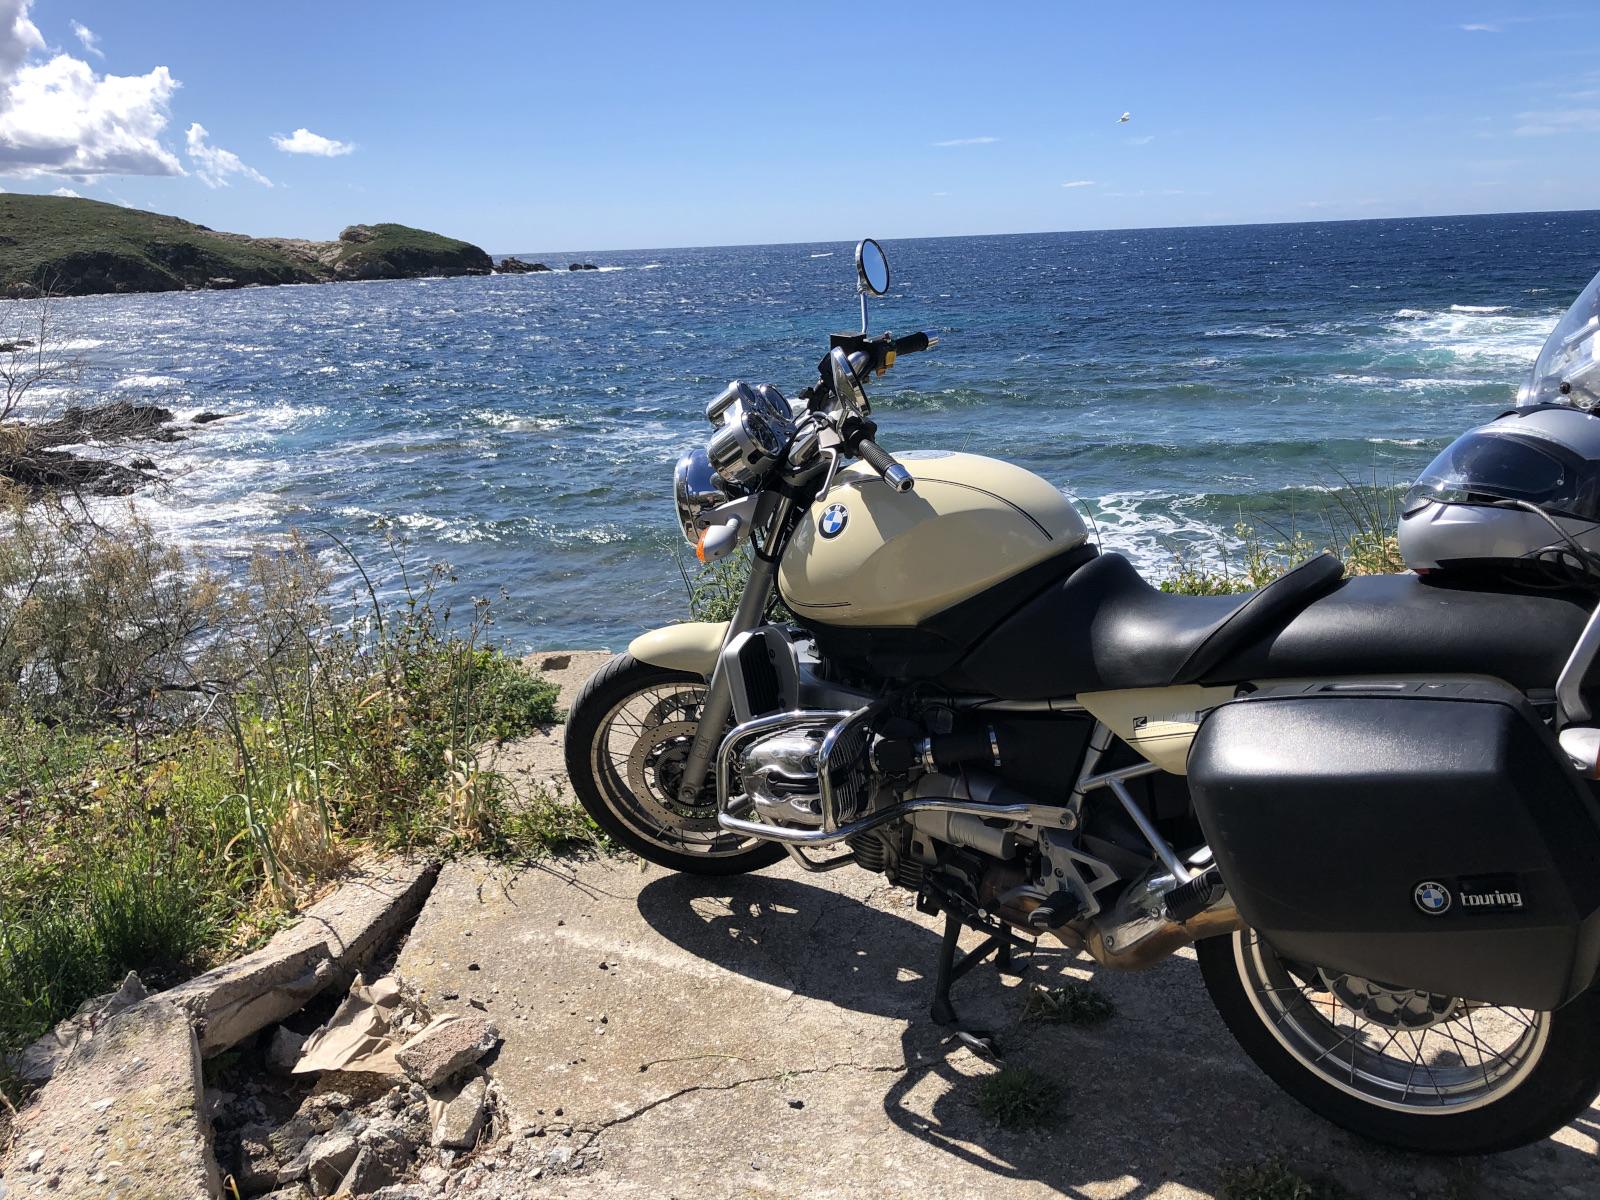 Motorrad an sonniger Felsenküste auf der Insel Korsika.